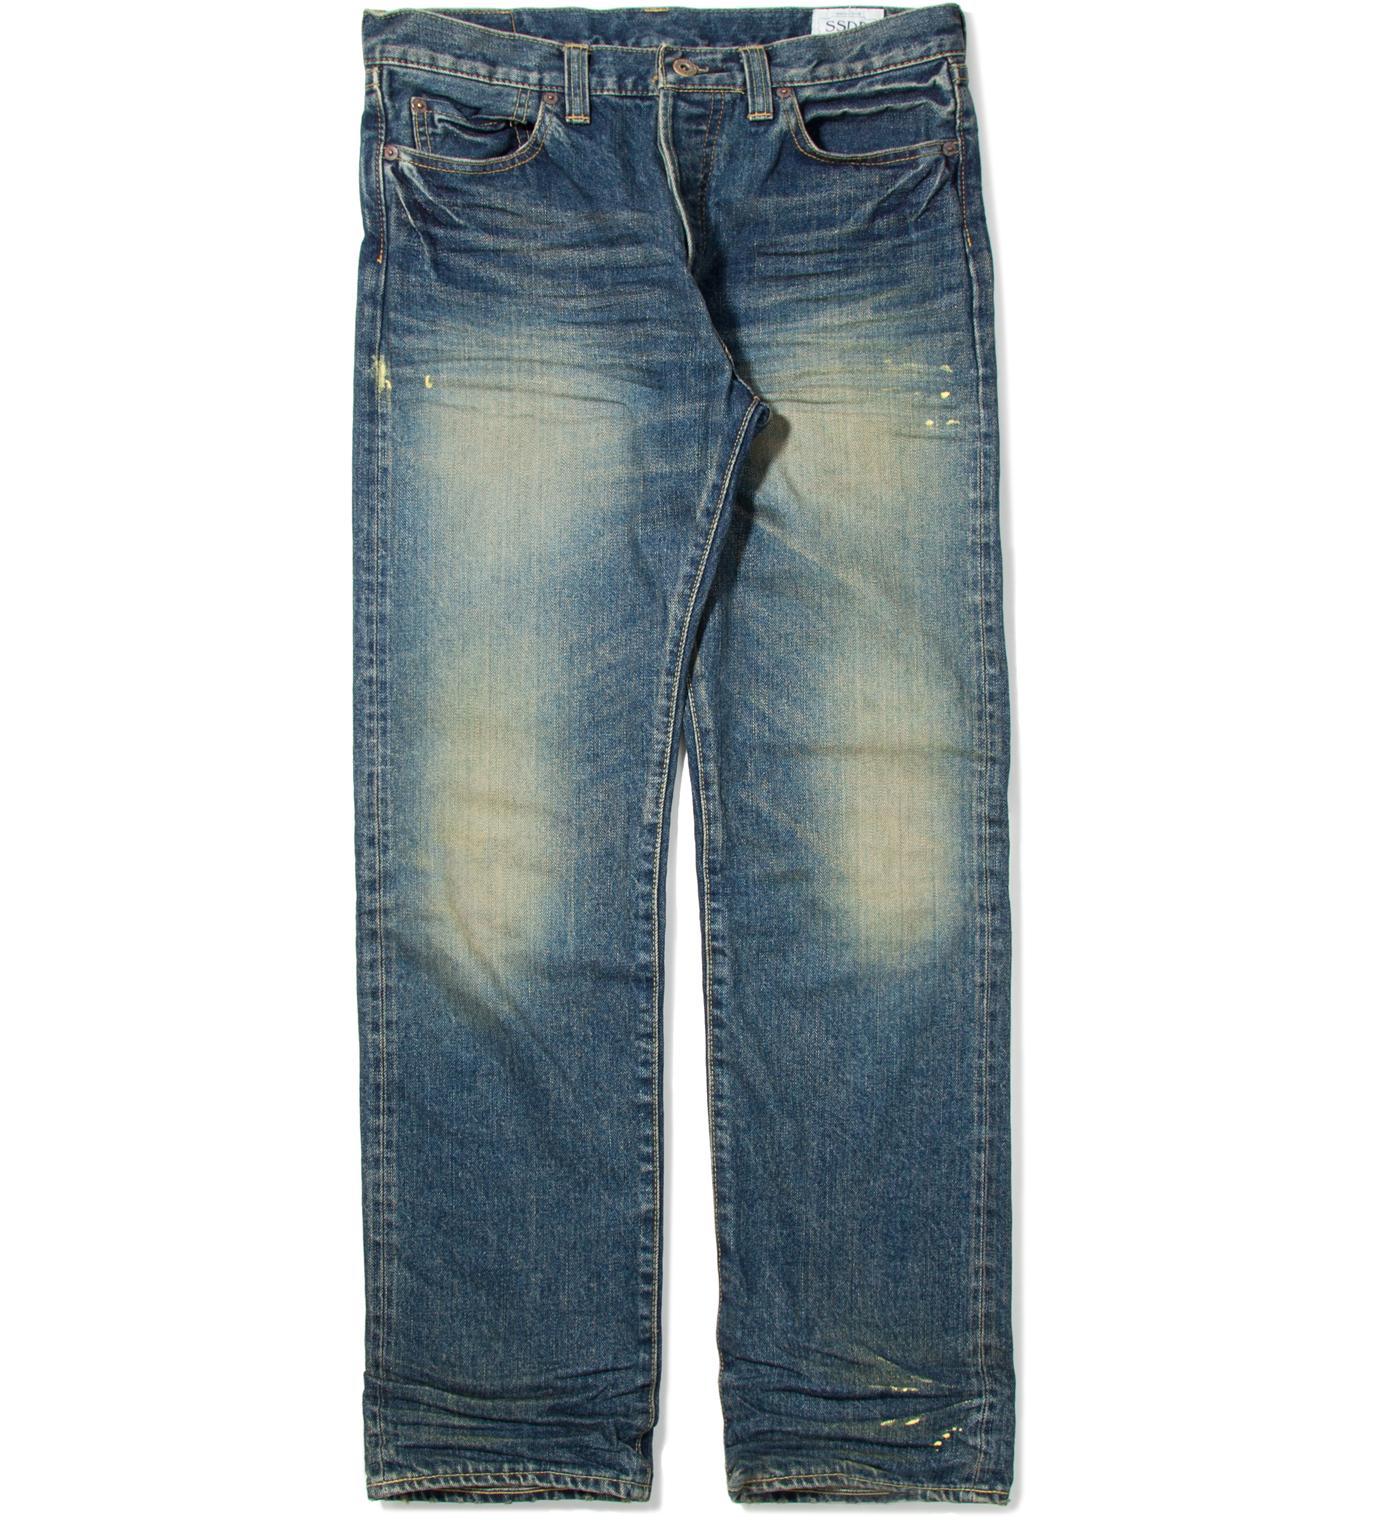 FUCT SSDD Wash SSDD Selvedge Narrow Denim Jeans